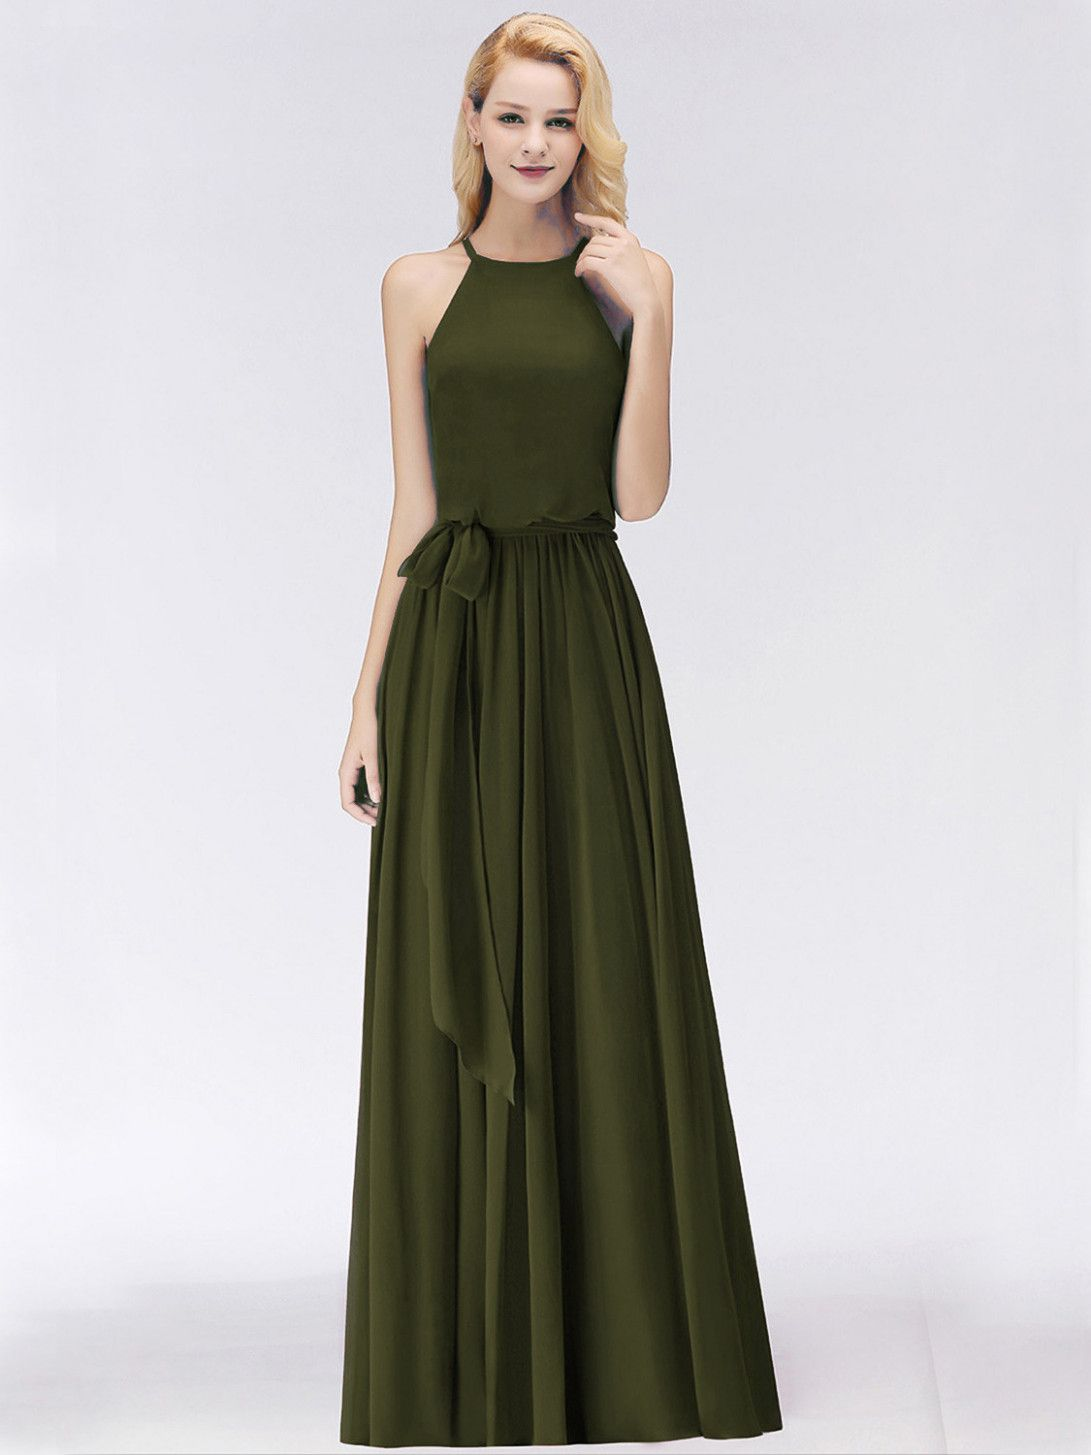 8 Lange Abendkleider in 8  Abendkleider elegant, Elegante